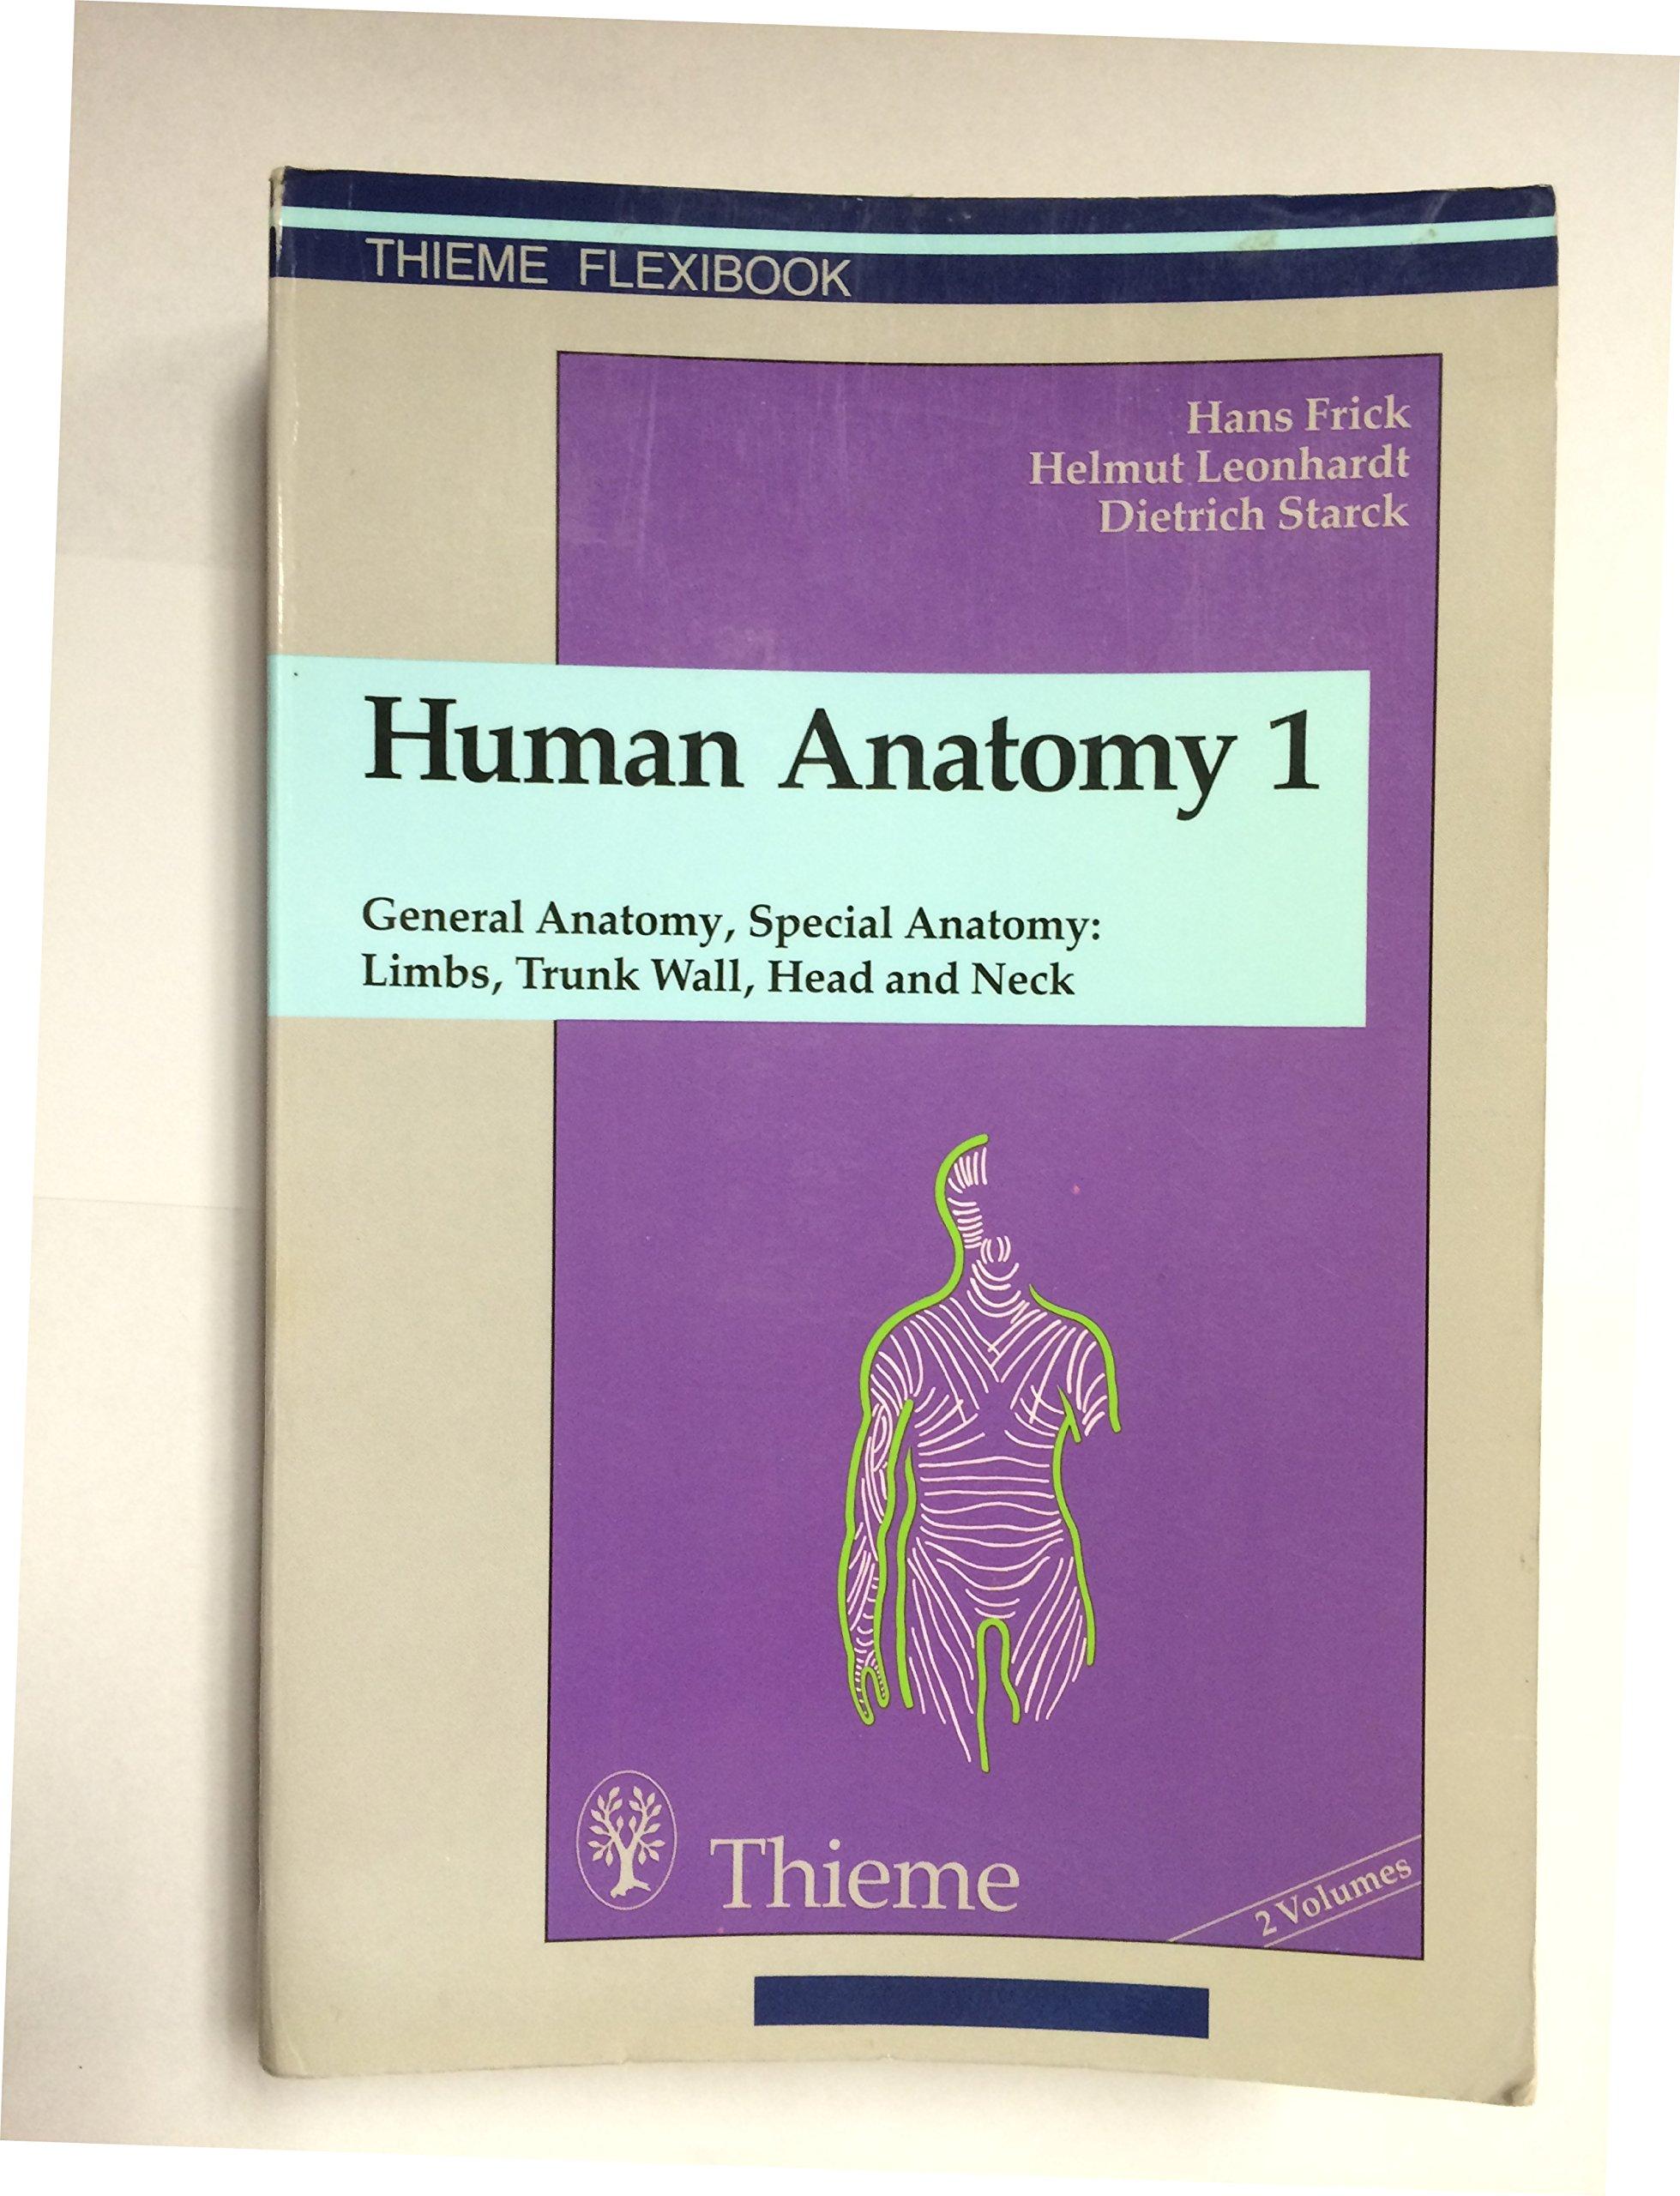 Human Anatomy General Anatomy Special Anatomy Limbs Trunk Wall